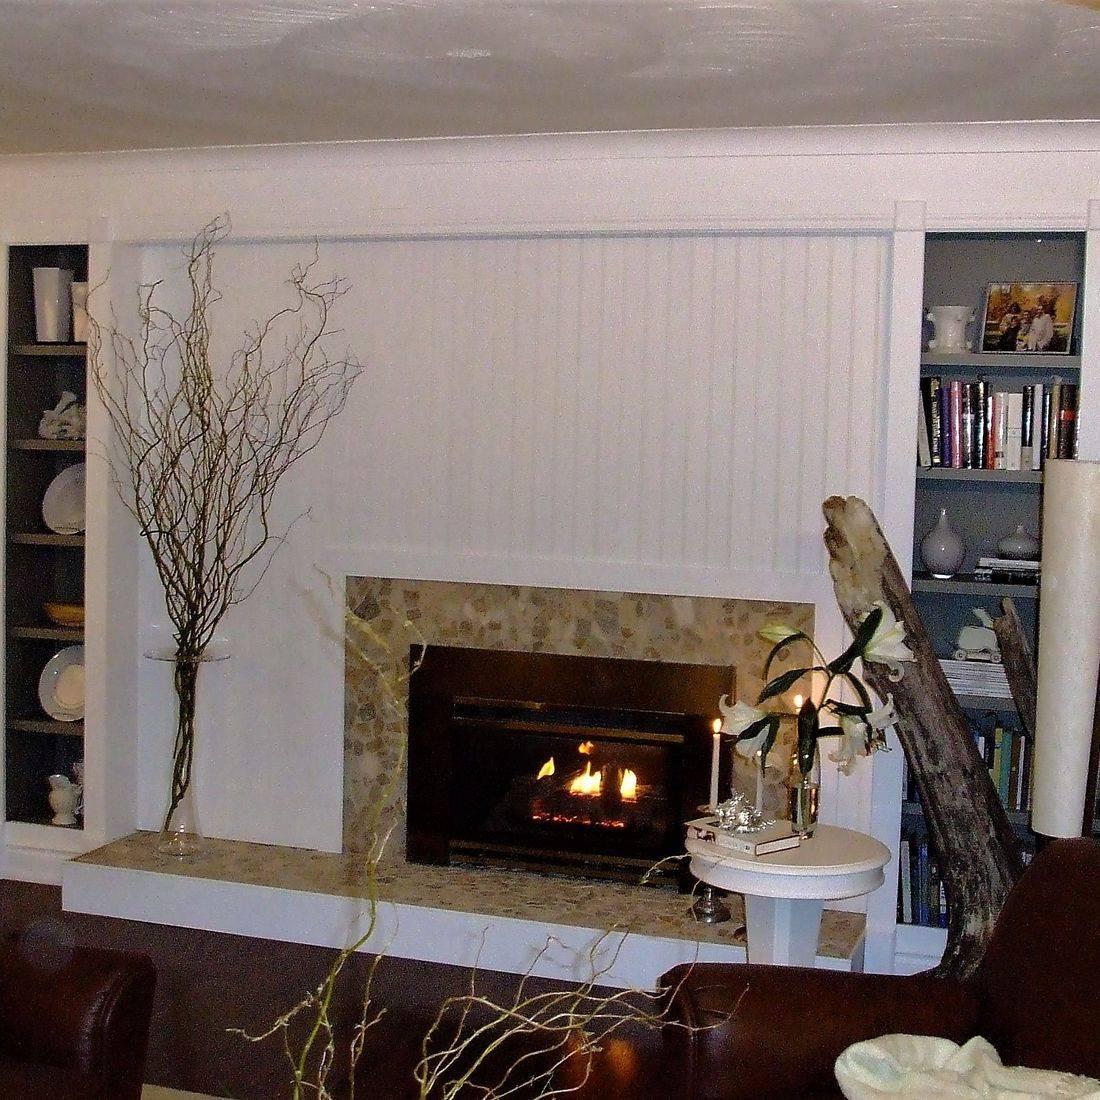 Sibra Kitchens Markham Toronto cabinets fireplace surround HGTV